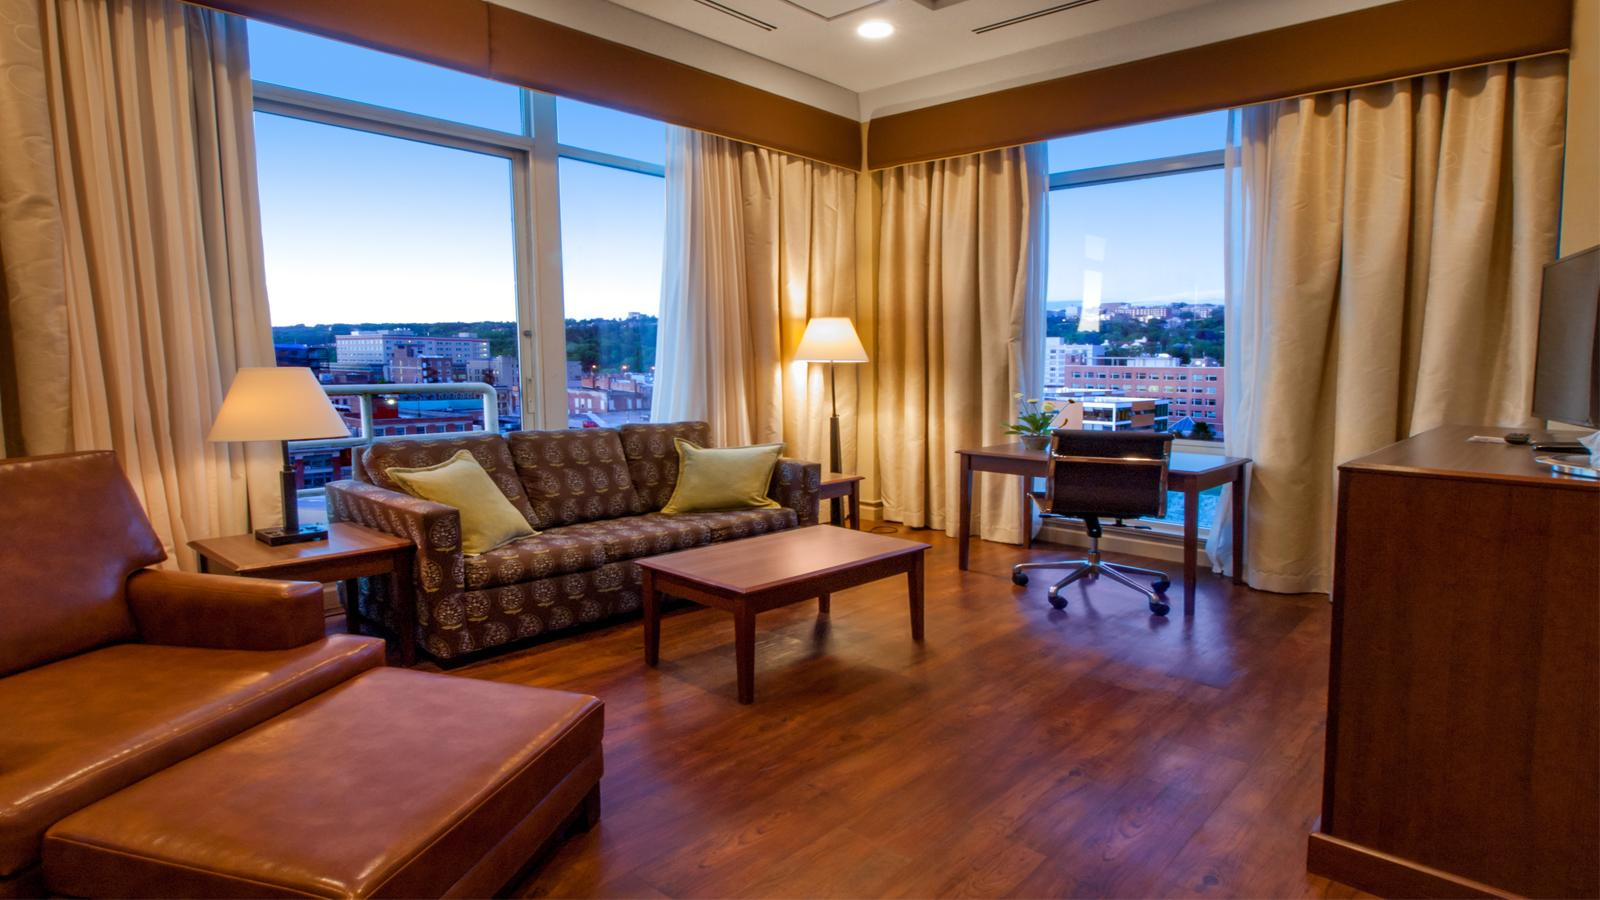 Hotel Ithaca in Ithaca (NY) - Room Deals, Photos & Reviews